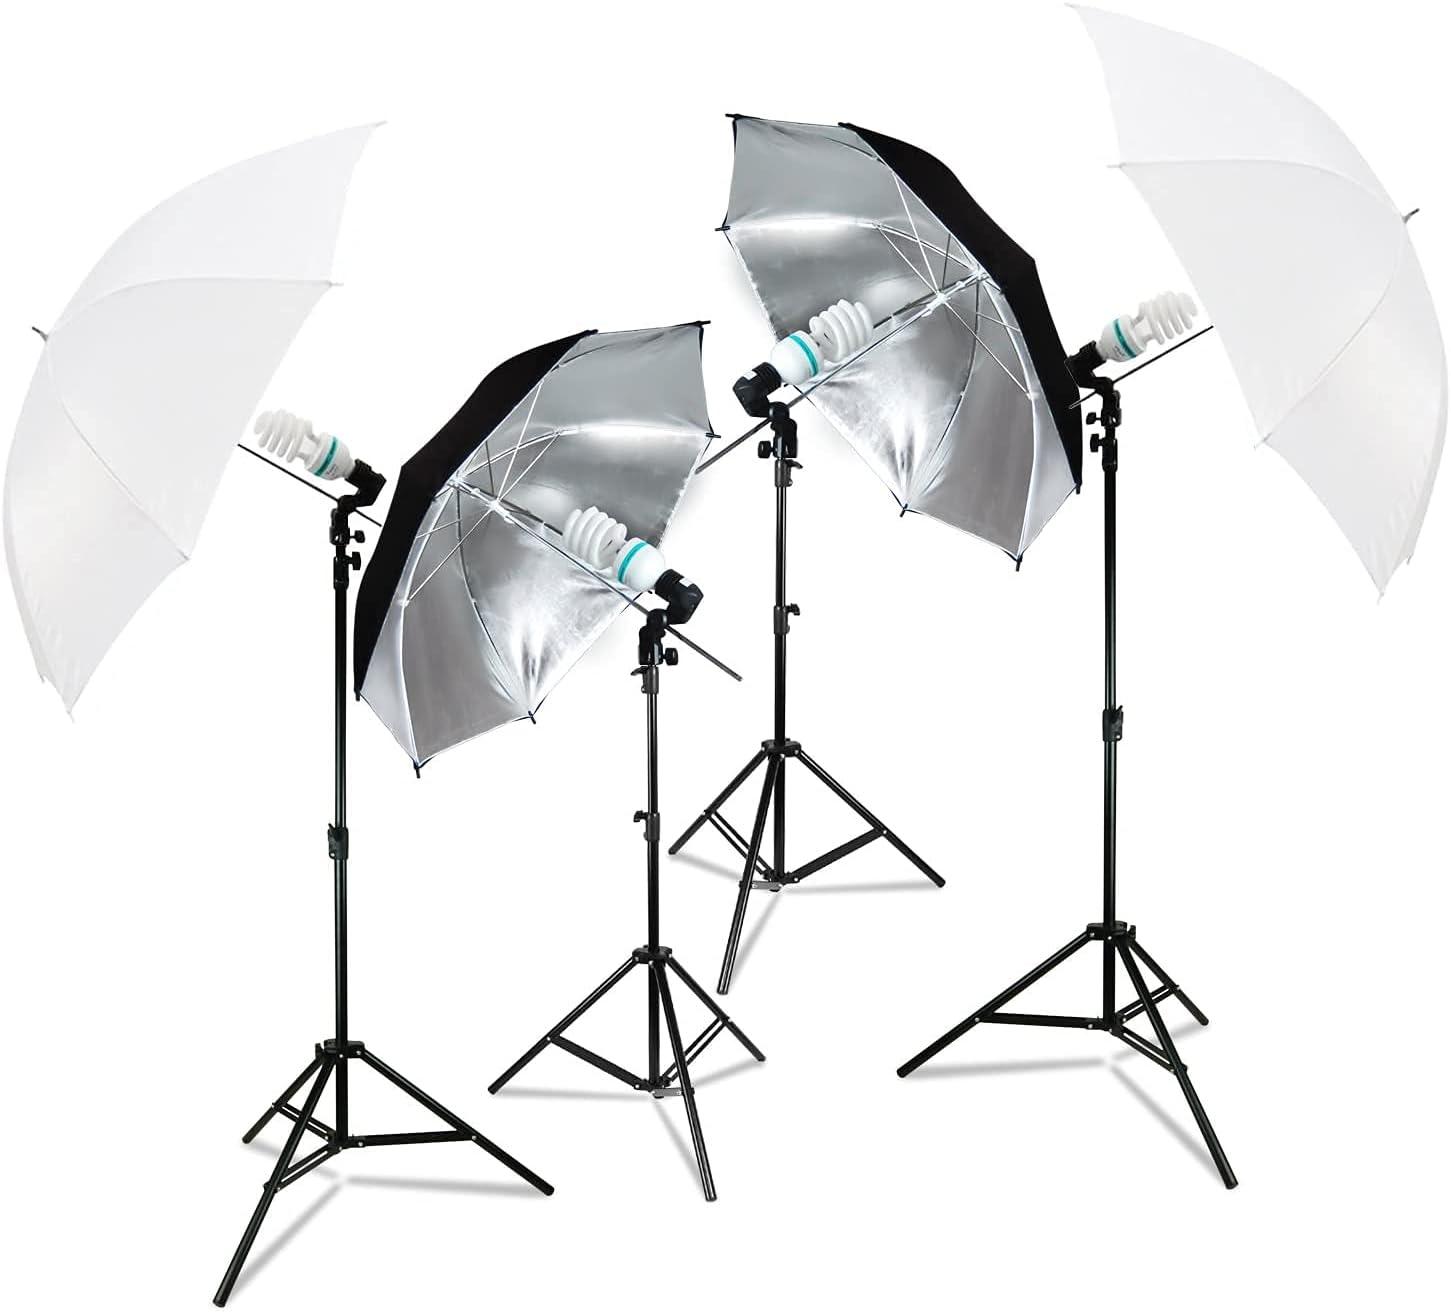 LimoStudio Set Arlington Mall Albuquerque Mall of 2 White and Black Umbrella Lighting K Silver